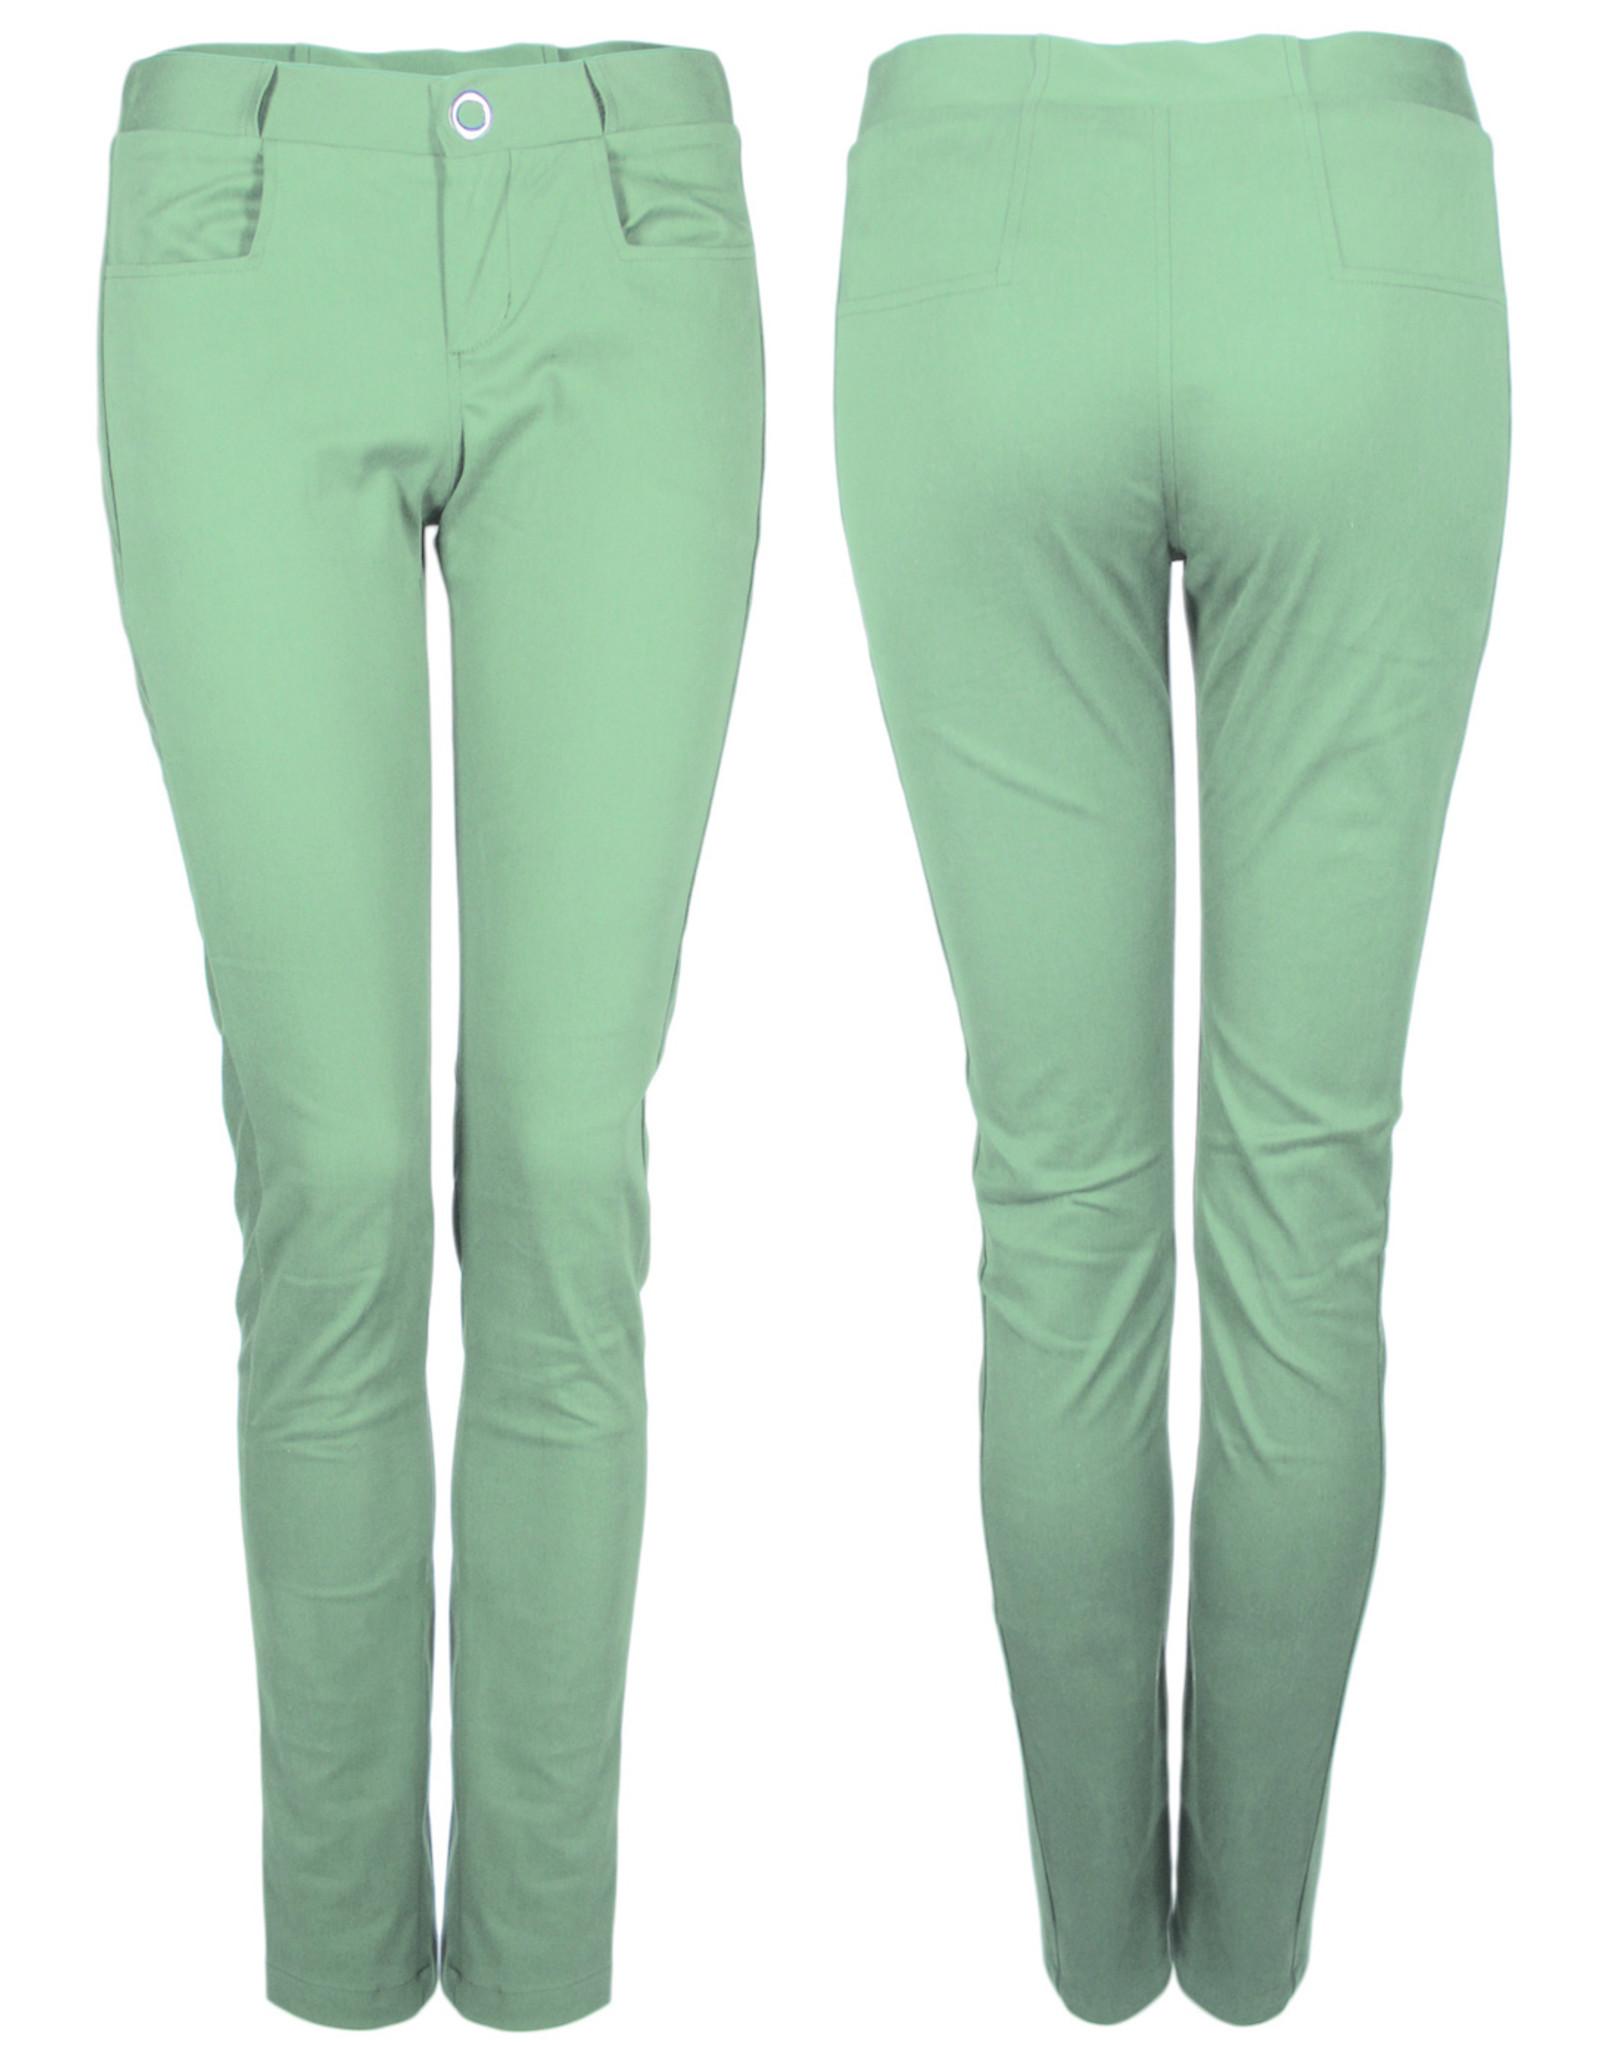 format TREK pants, canvas